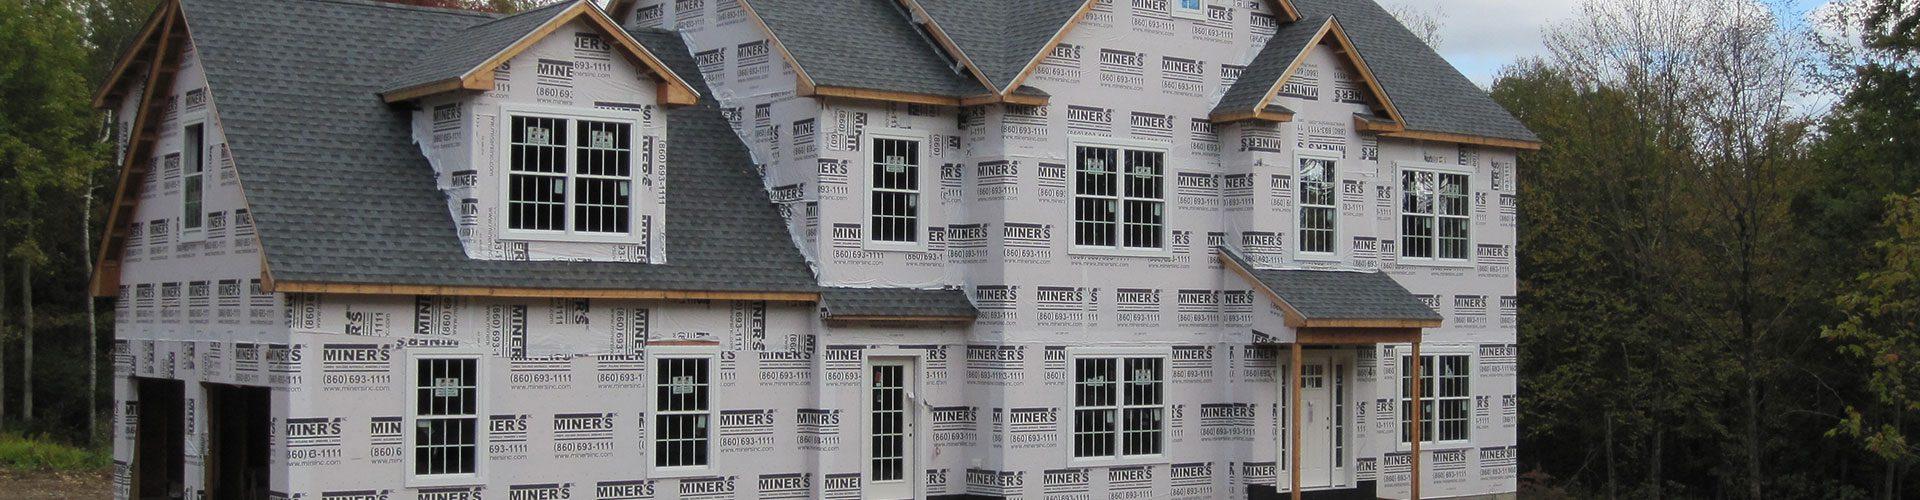 Exterior of home before siding